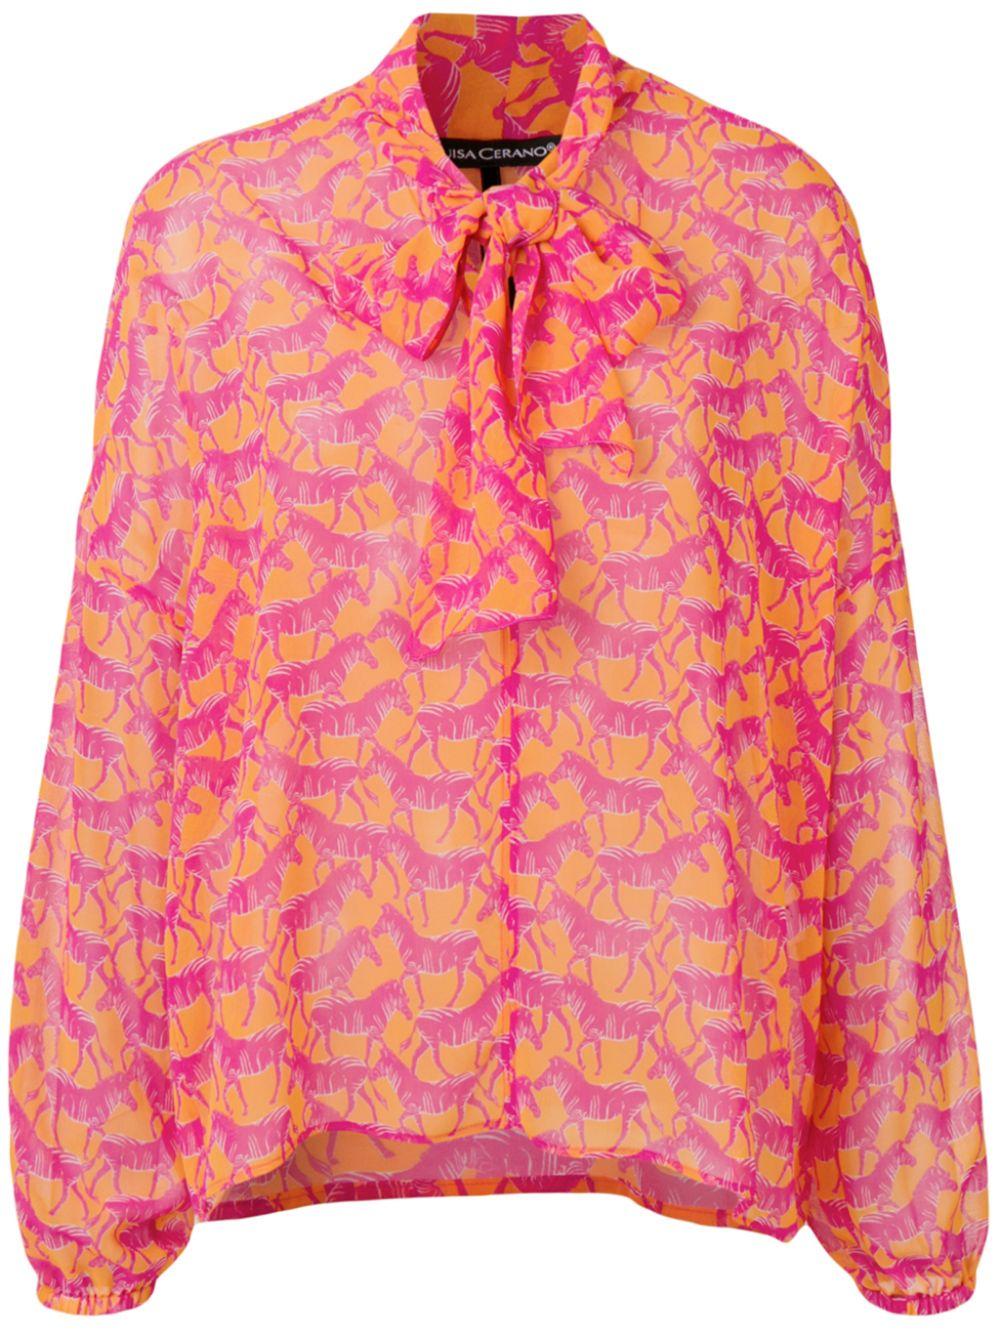 Luisa Cerano | блузка с изображением зебры | Clouty